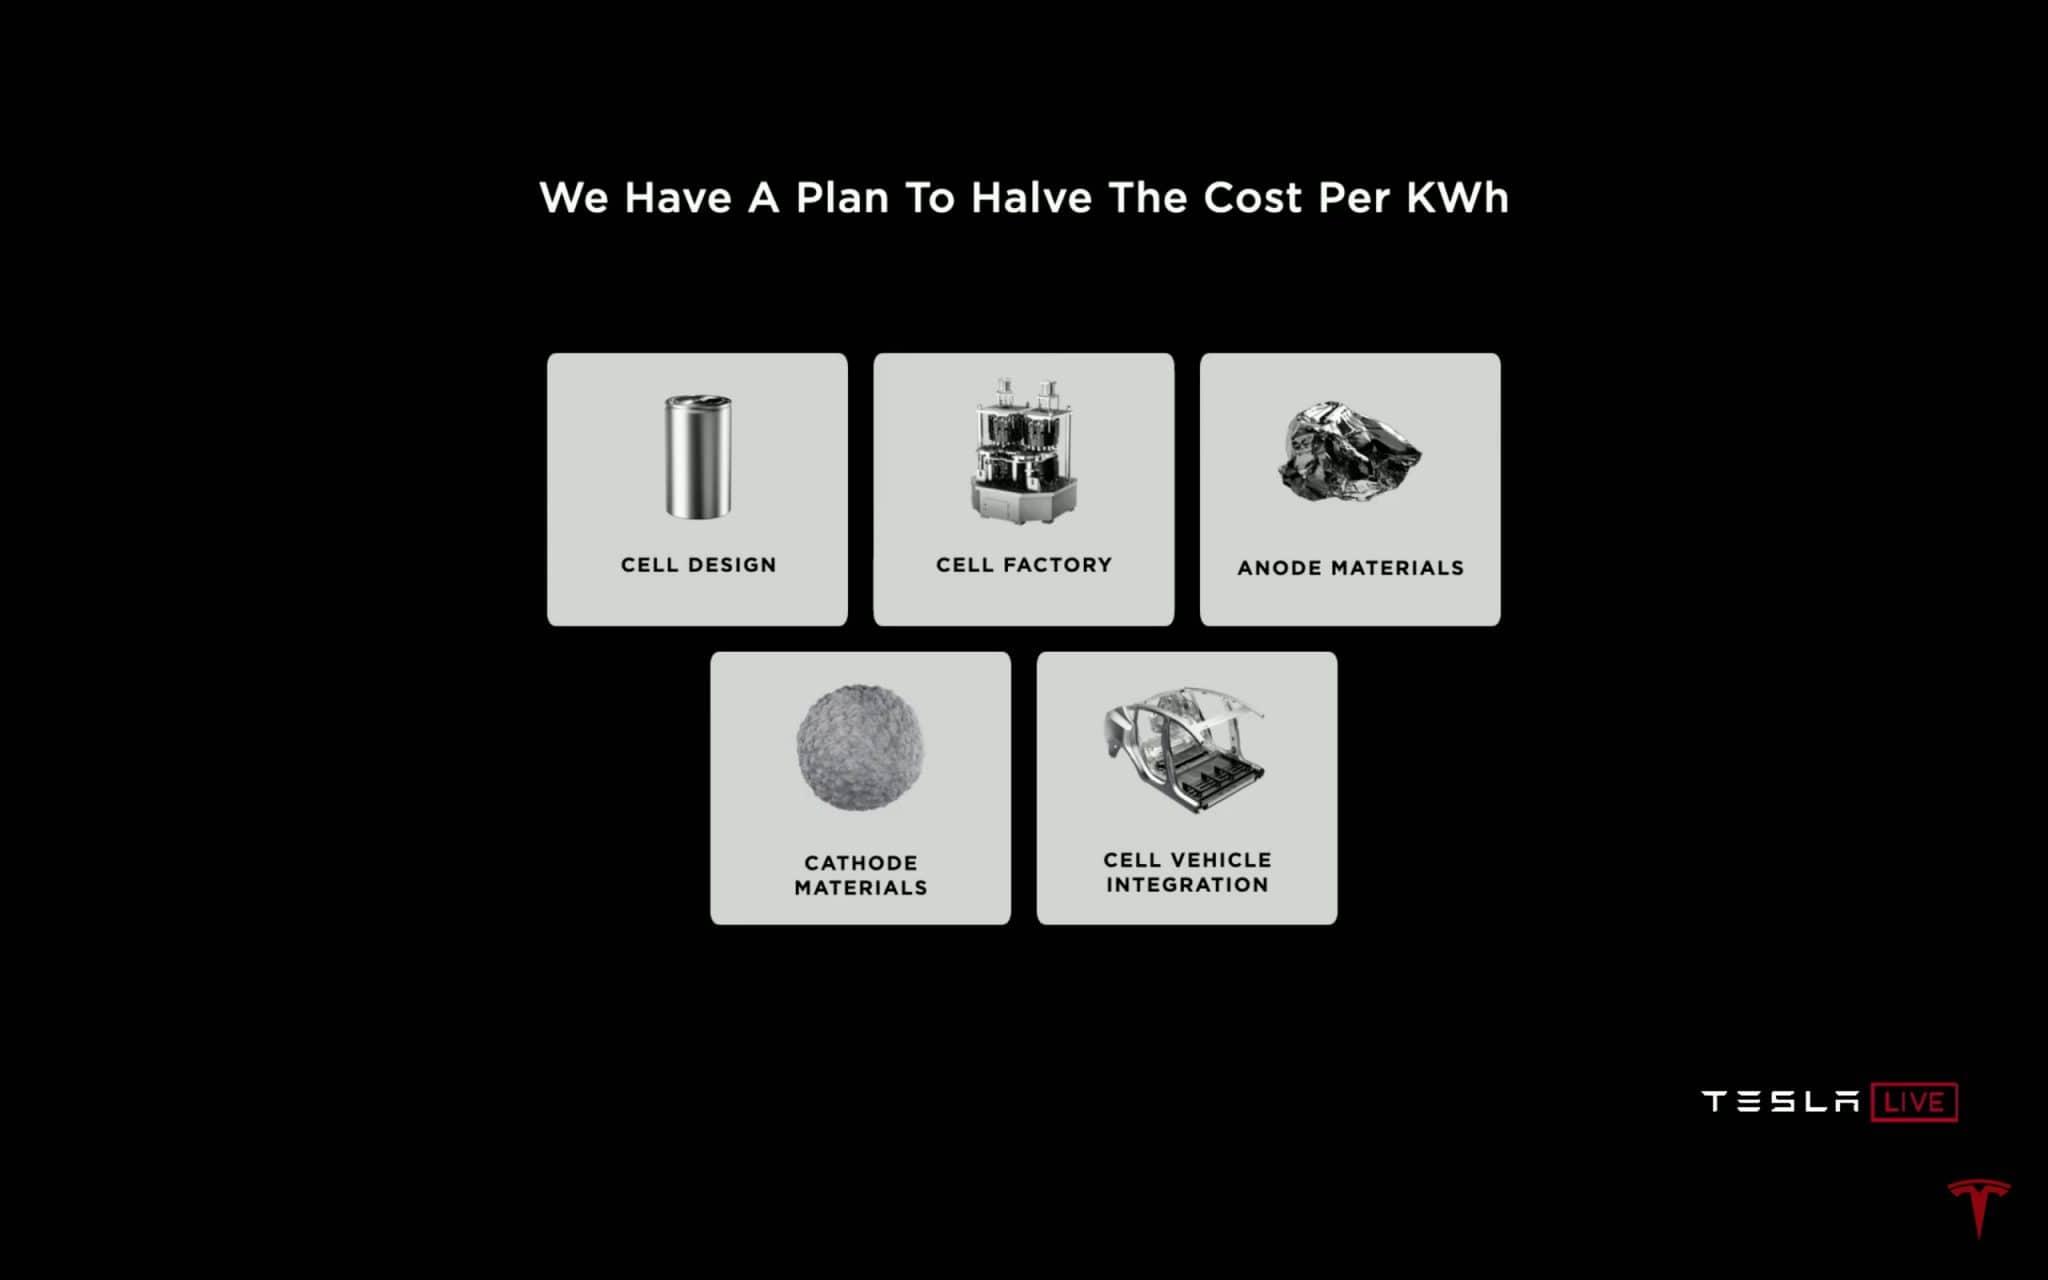 Tesla, diminution des coûts